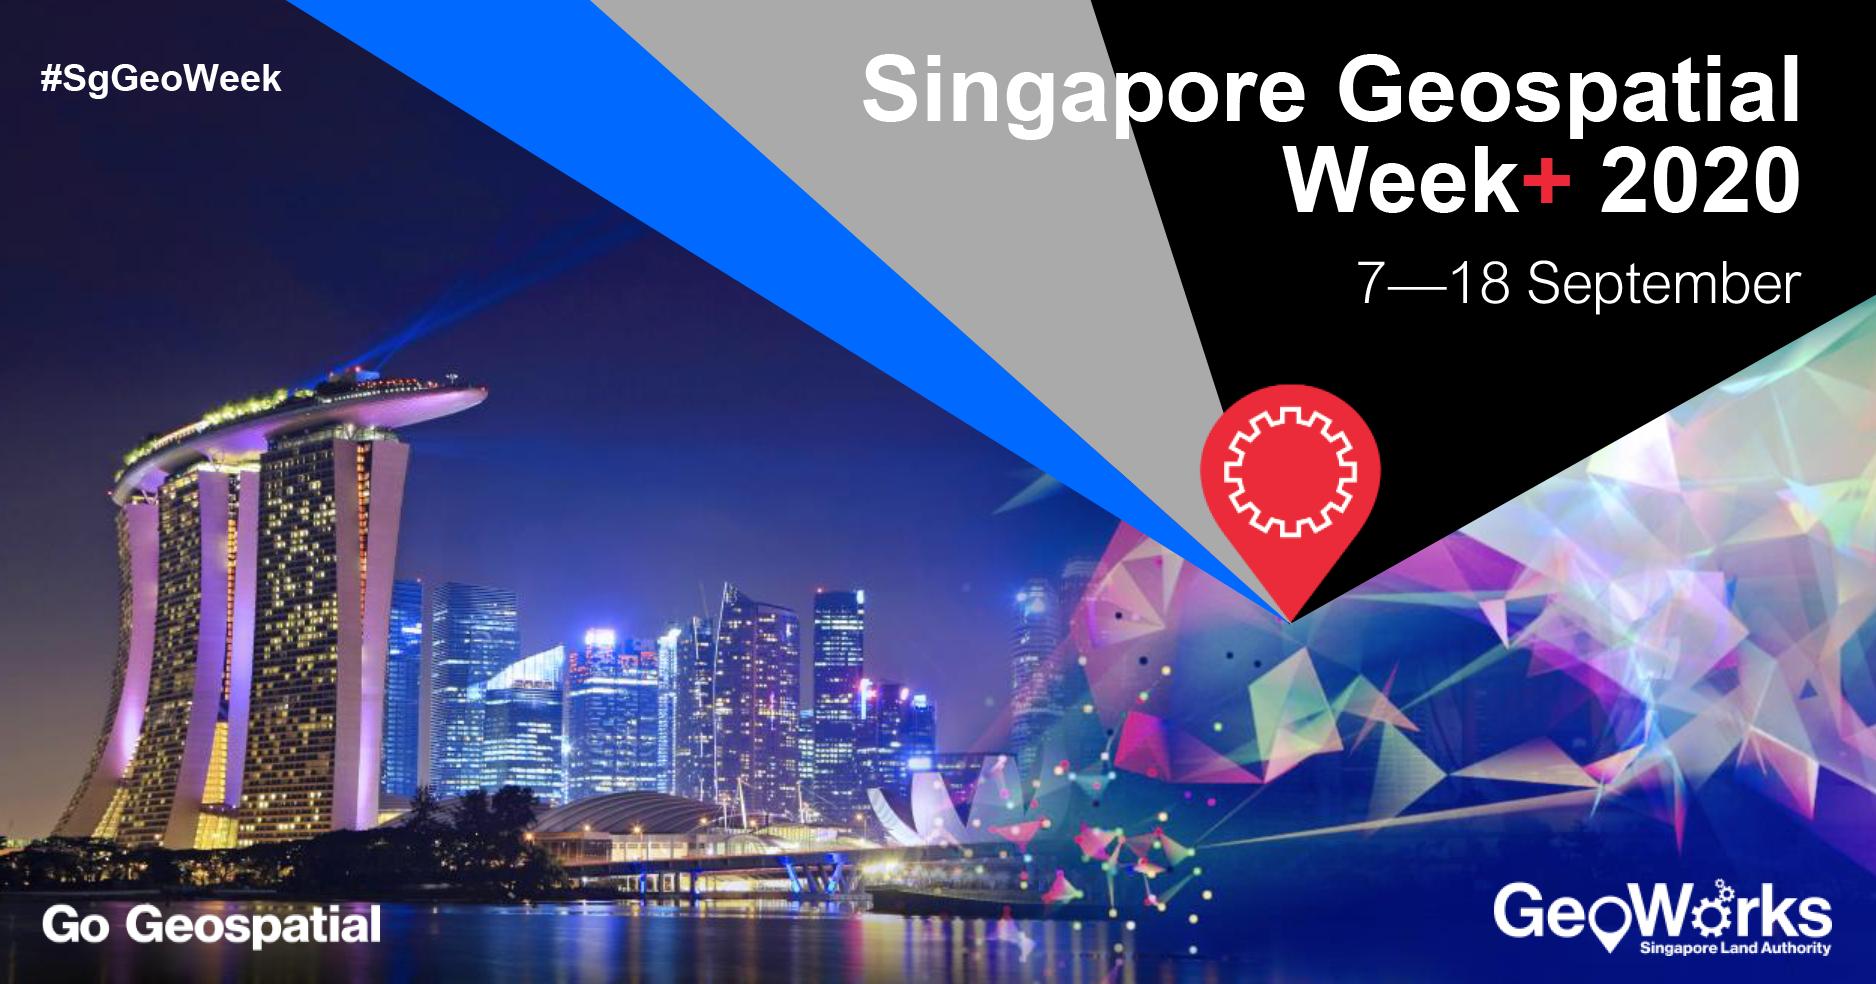 Singapore Geospatial Week + 2020 Banner Image